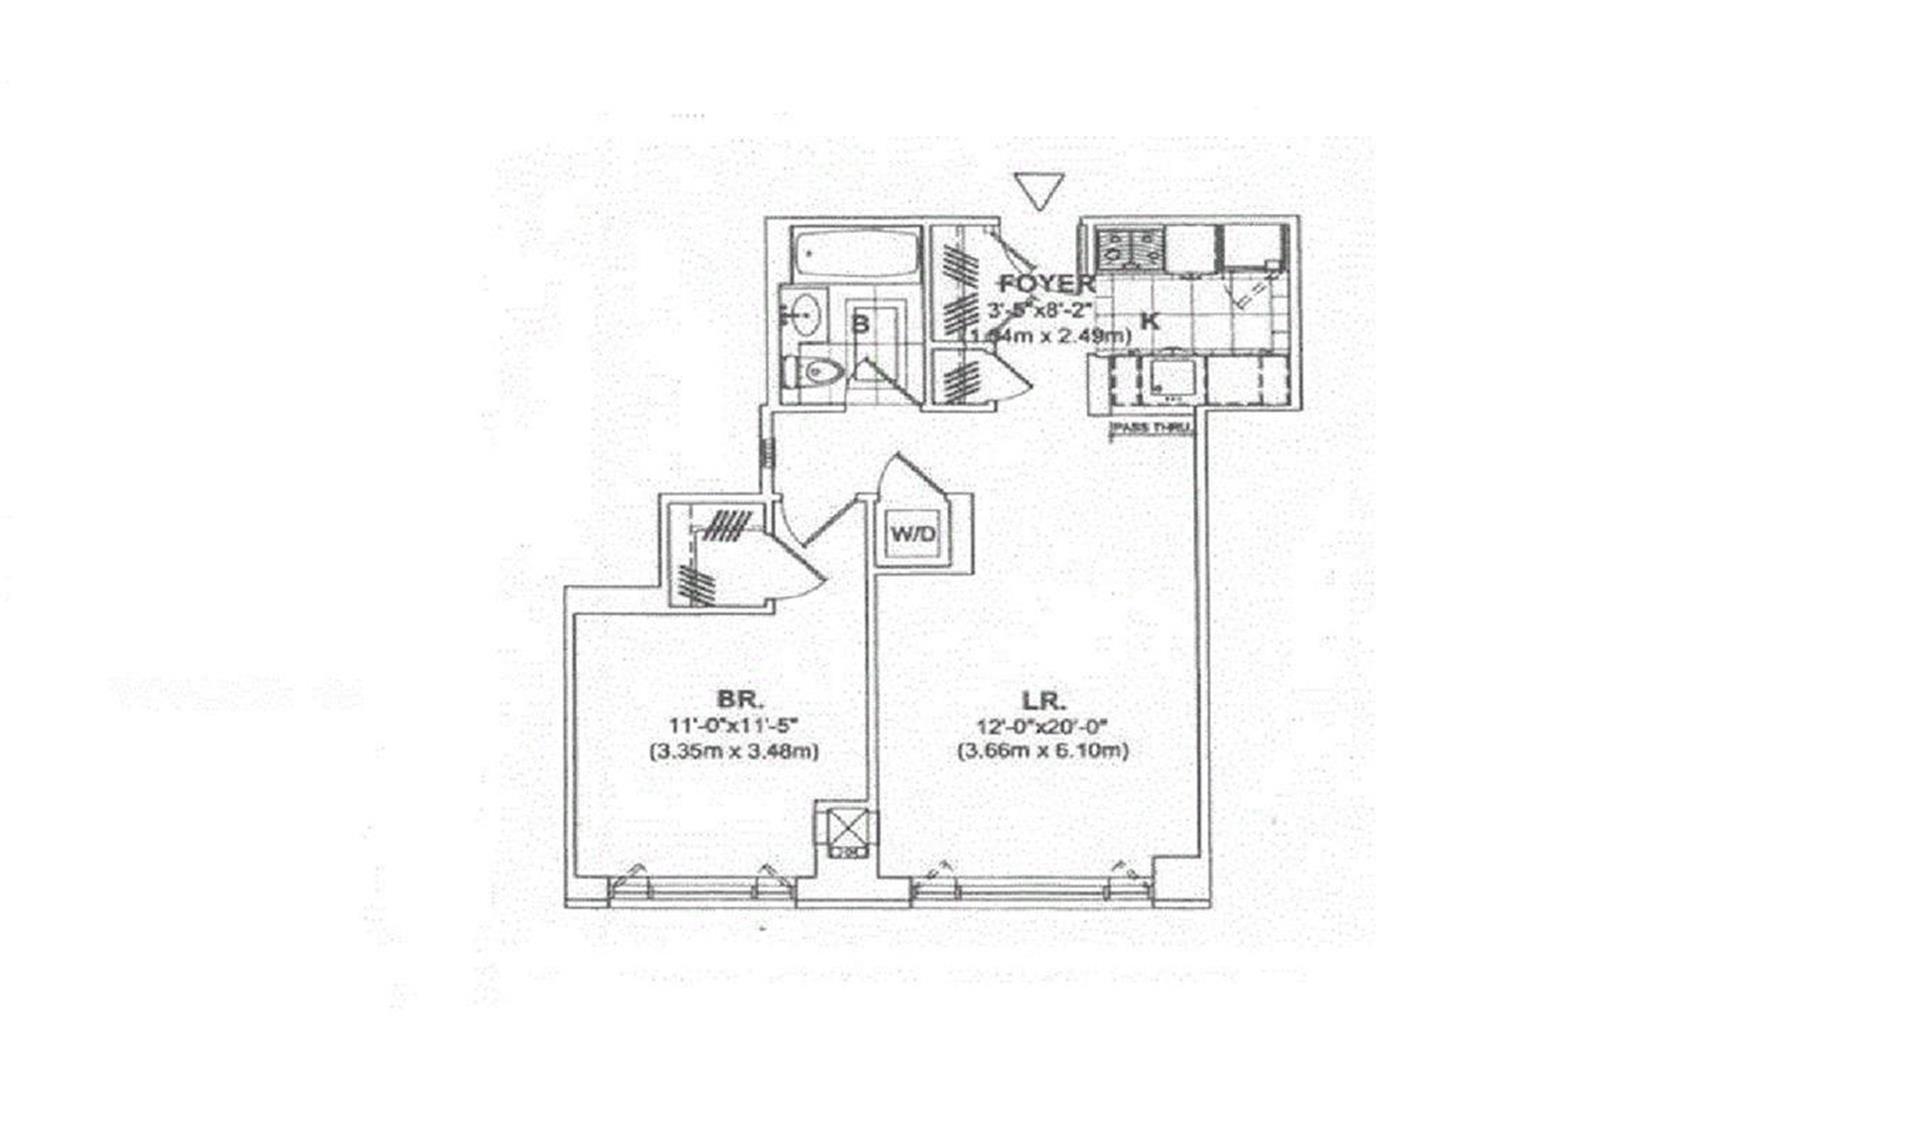 Floor plan of 205 East 85th Street, 5B - Upper East Side, New York